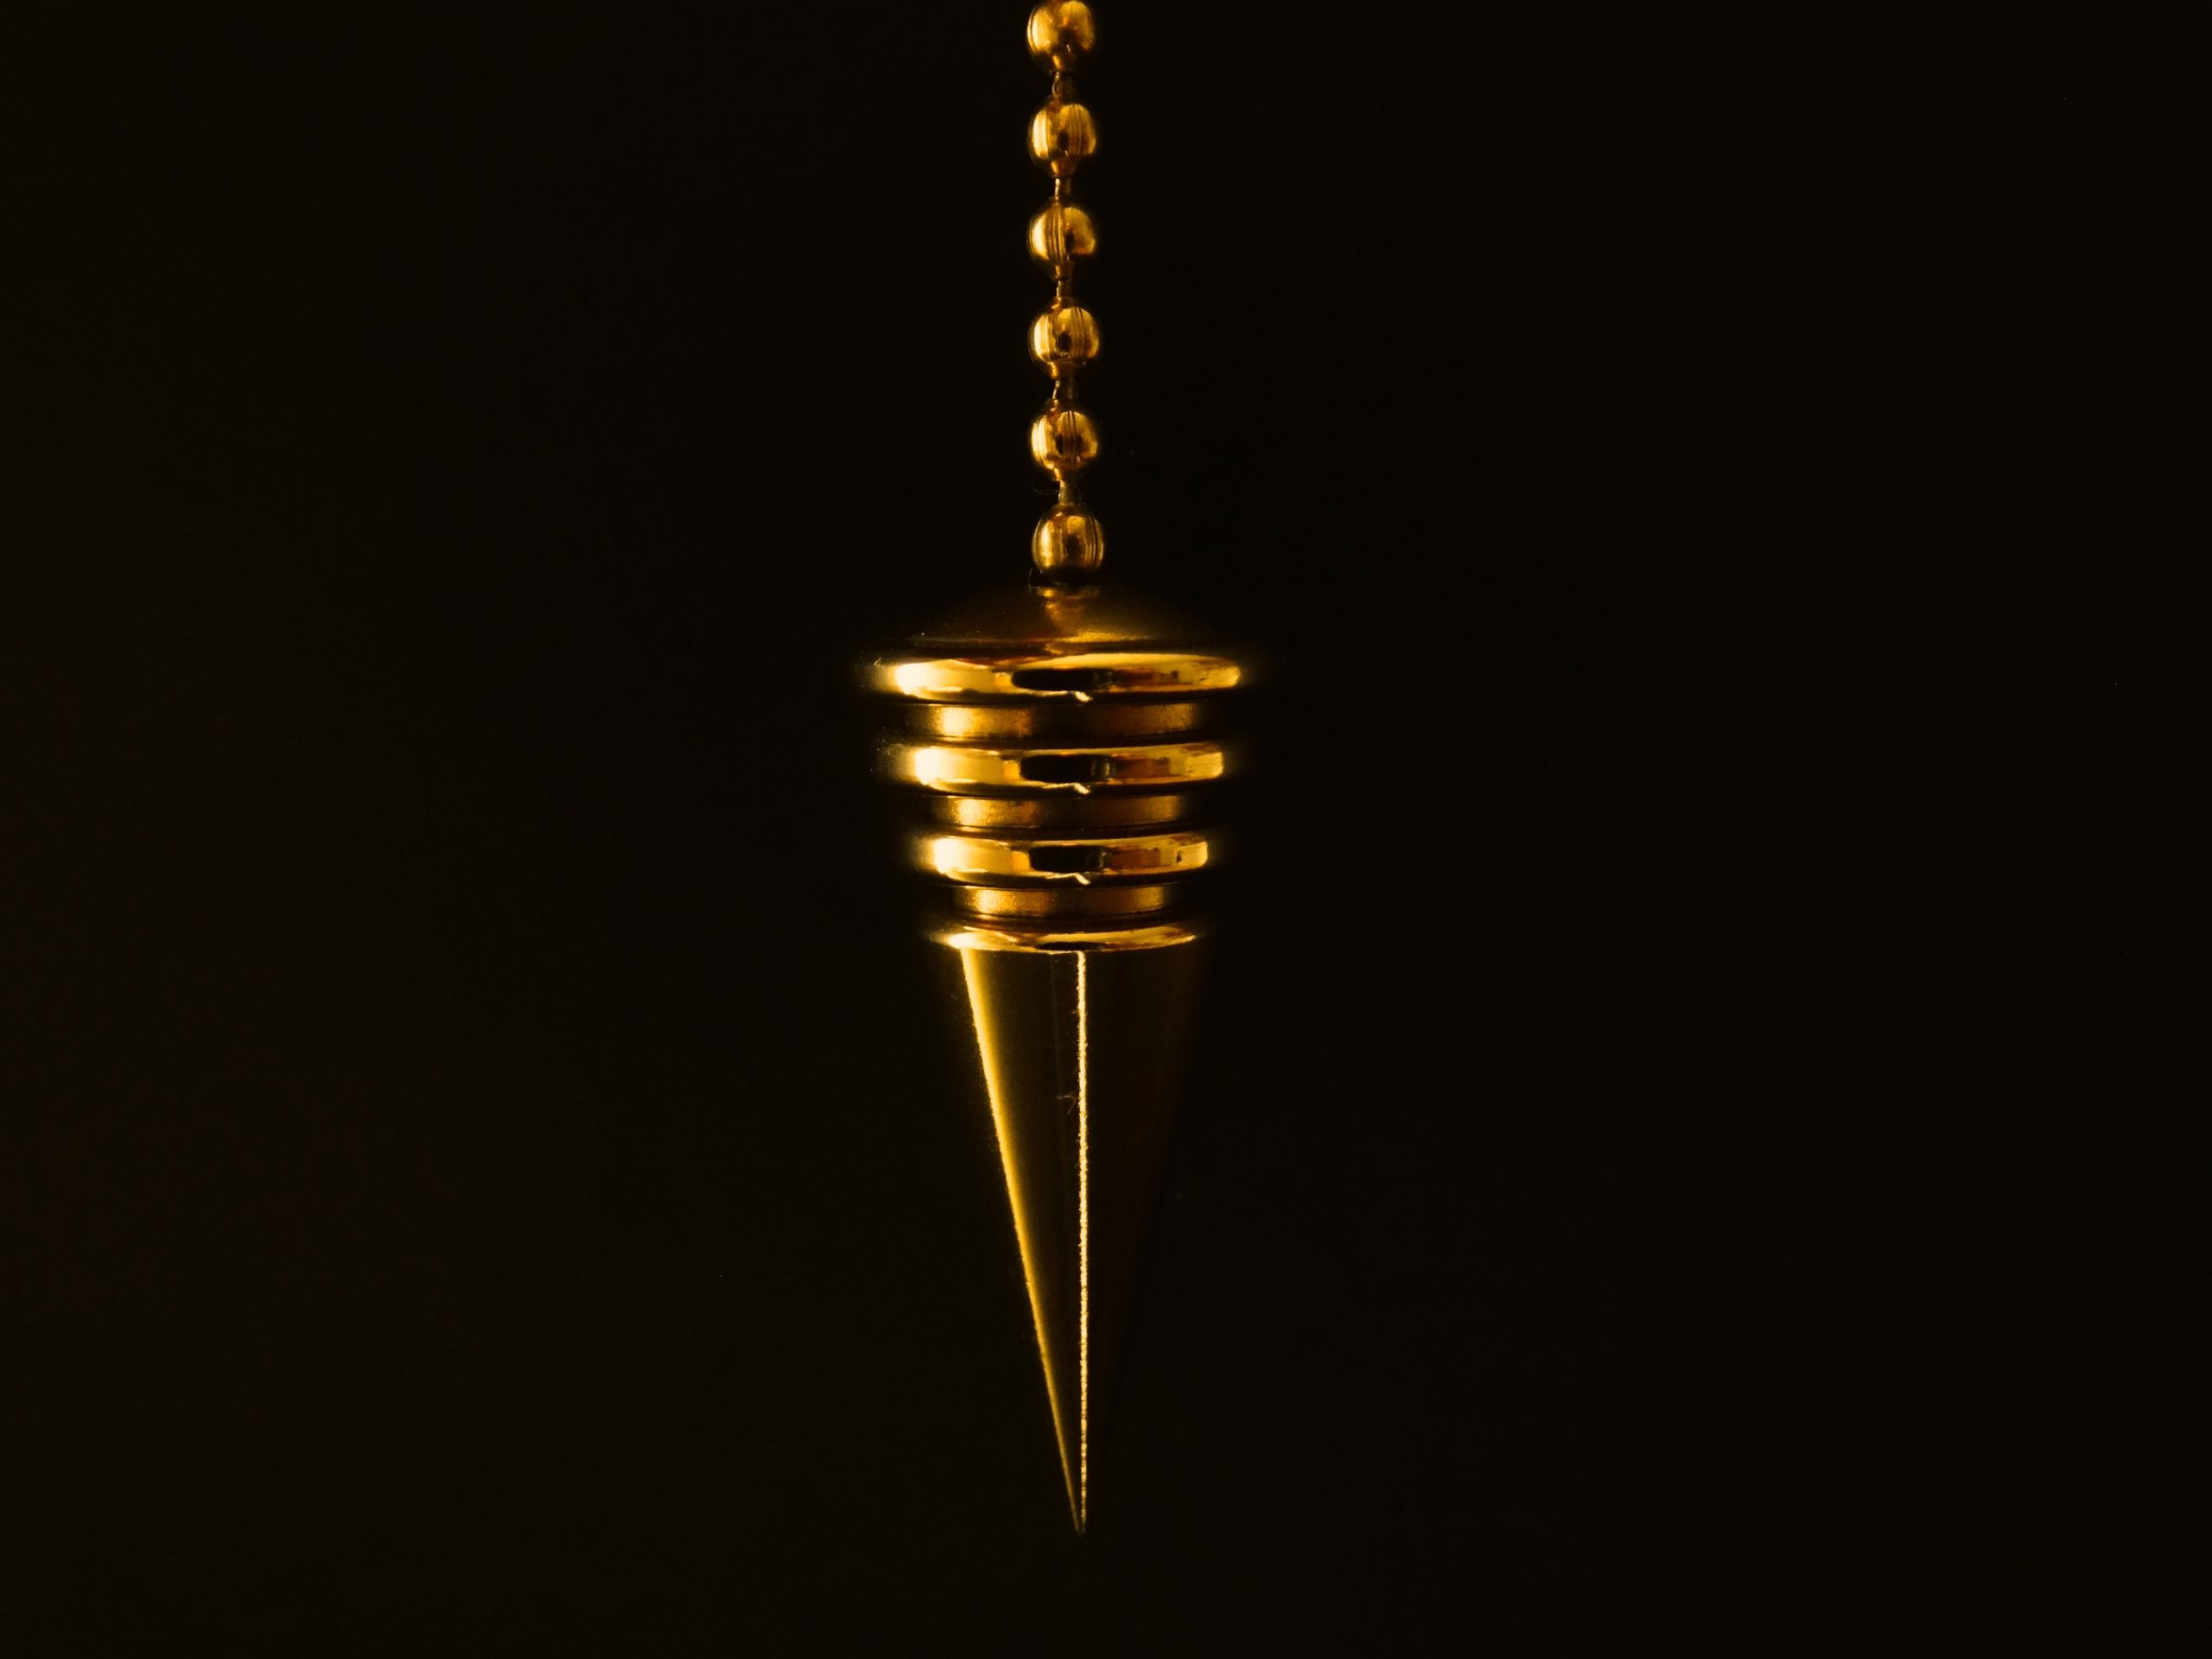 pendulum, cone, chain